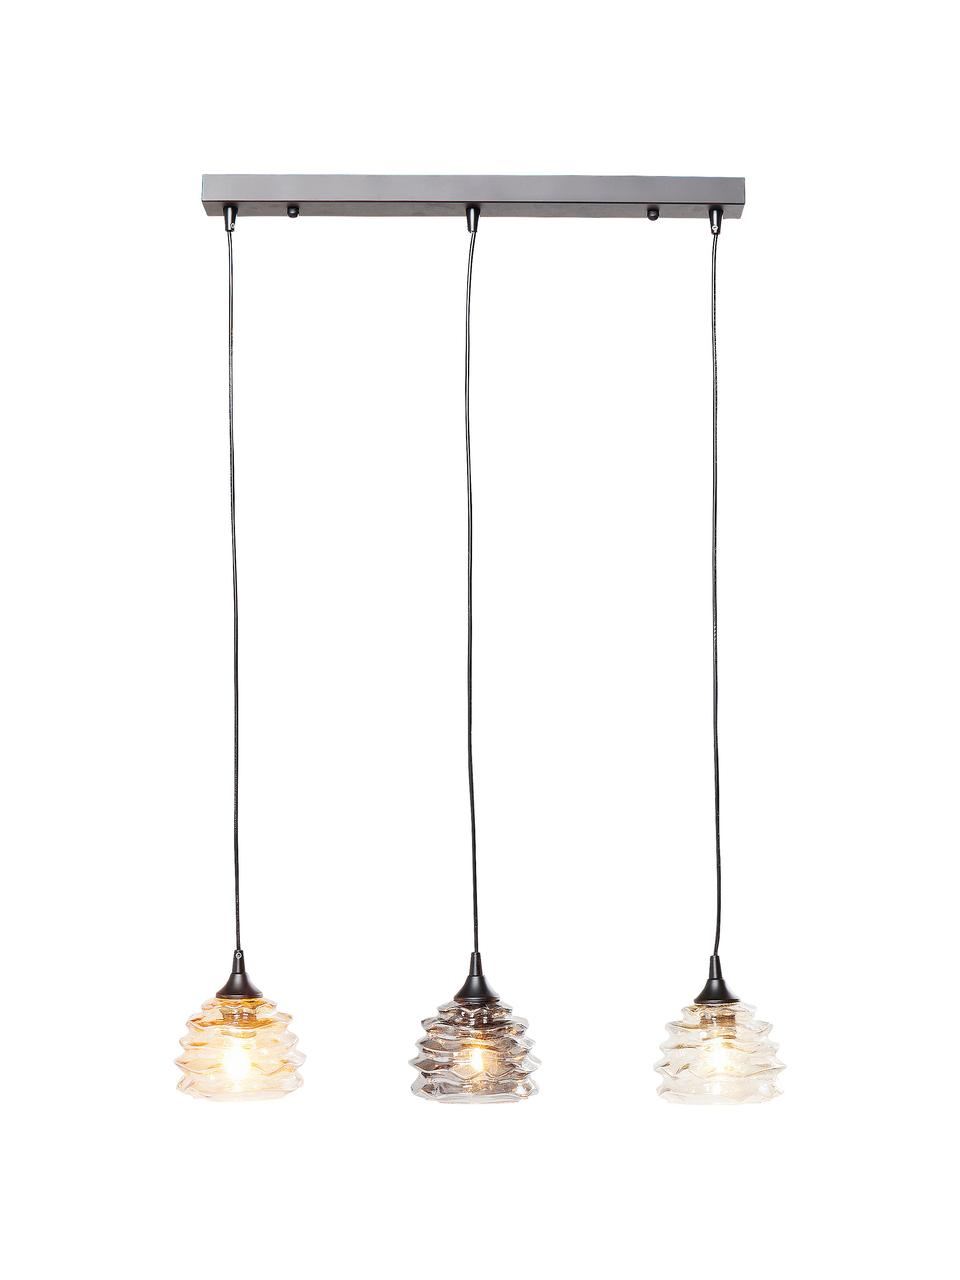 Závesná lampa Ruffle, Oranžová, sivá, odtiene jantárovej